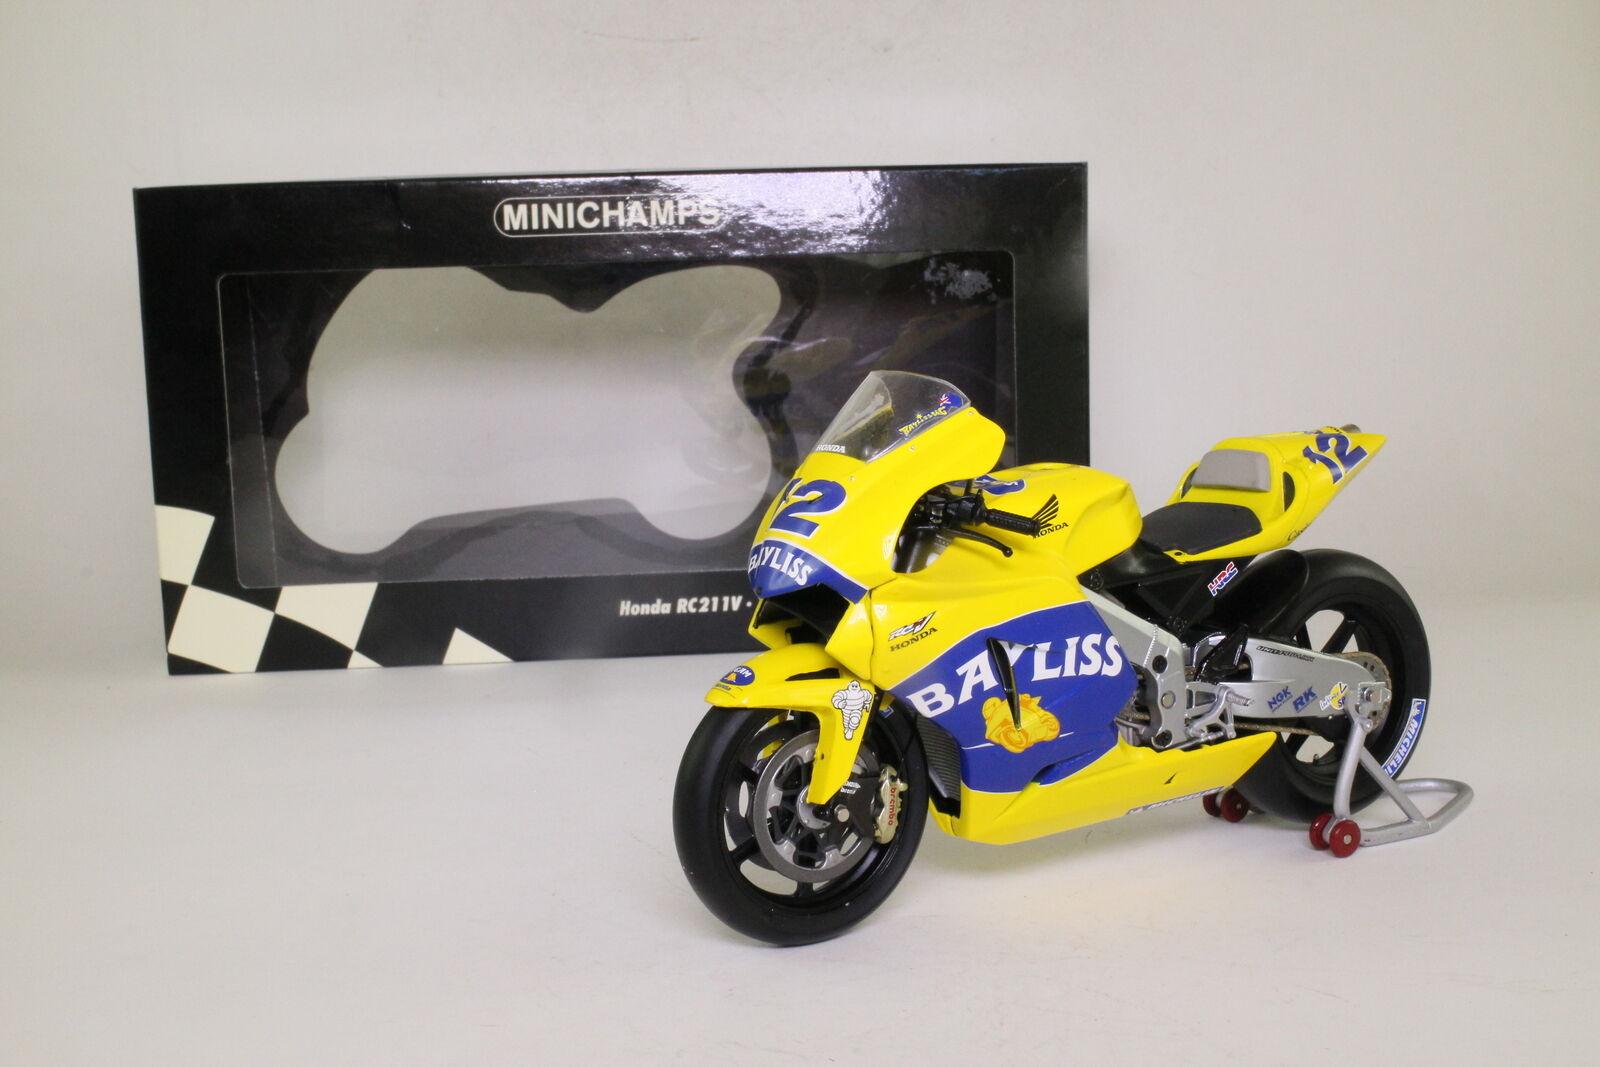 punto de venta de la marca Minichamps 122 051012; Honda RC211V; 2005 MotoGP, Troy Bayliss; Bayliss; Bayliss; Excelente En Caja  con 60% de descuento